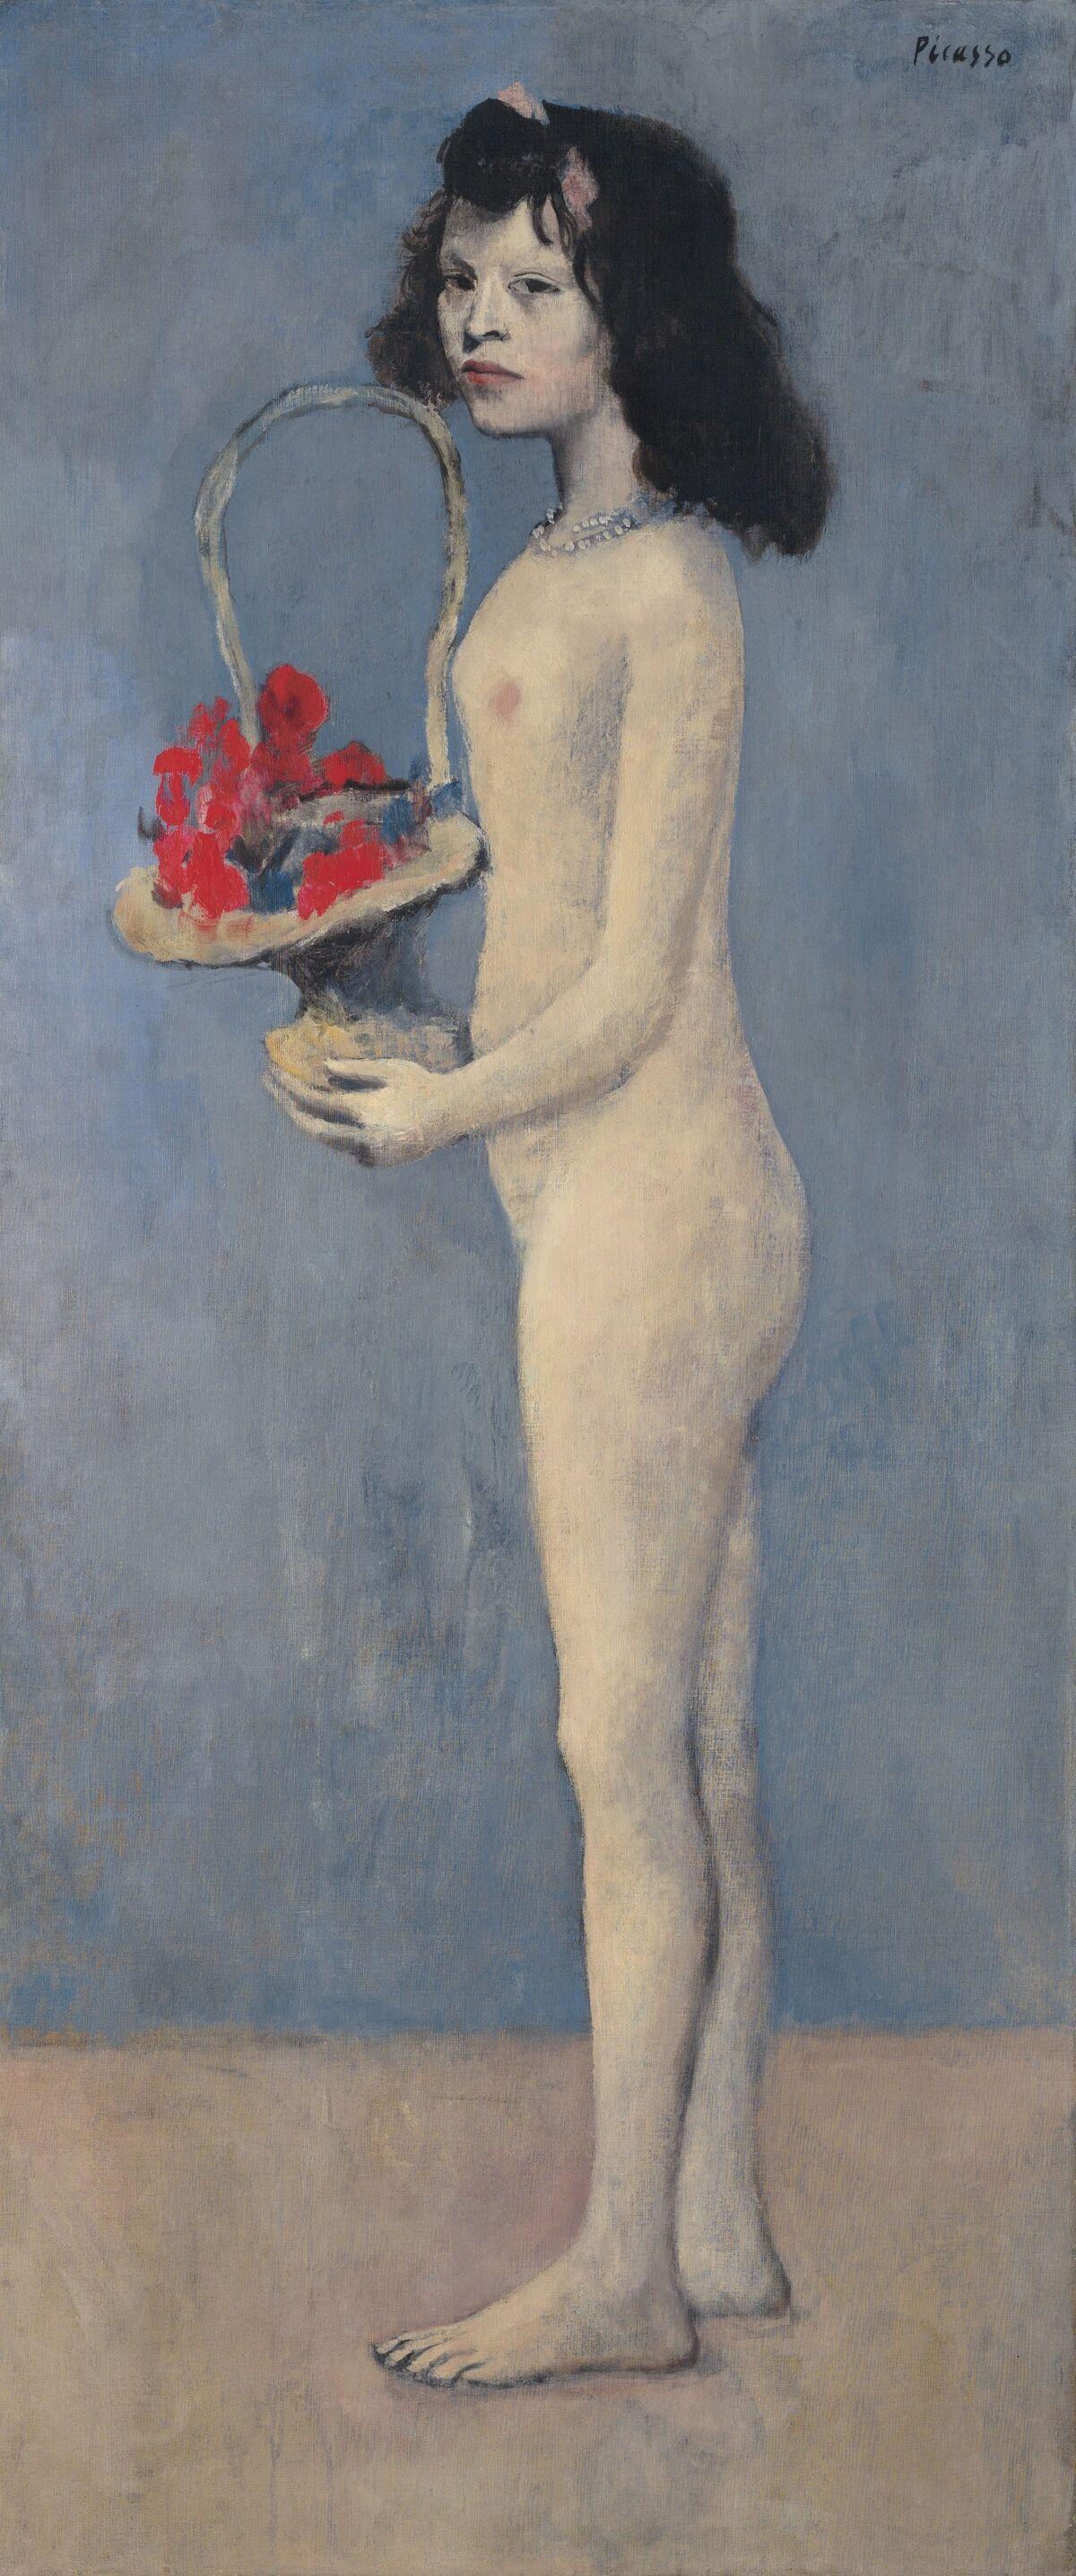 Pablo Picasso, Filette à la corbeille fleurie, 1905. © Estate of Pablo Picasso / Artists Rights Society (ARS), New York. Courtesy of Christie's.